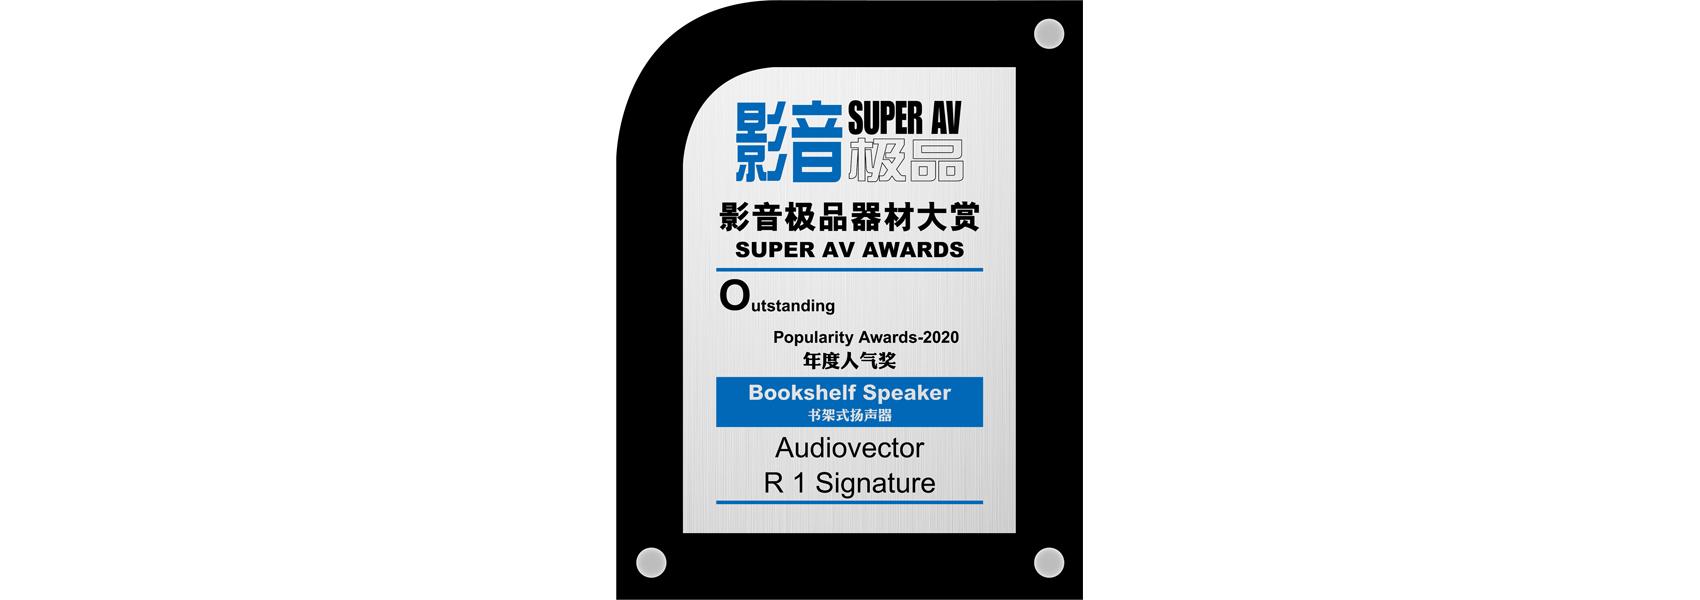 The Audiovector R 1 Signature had won the 2020 Award!